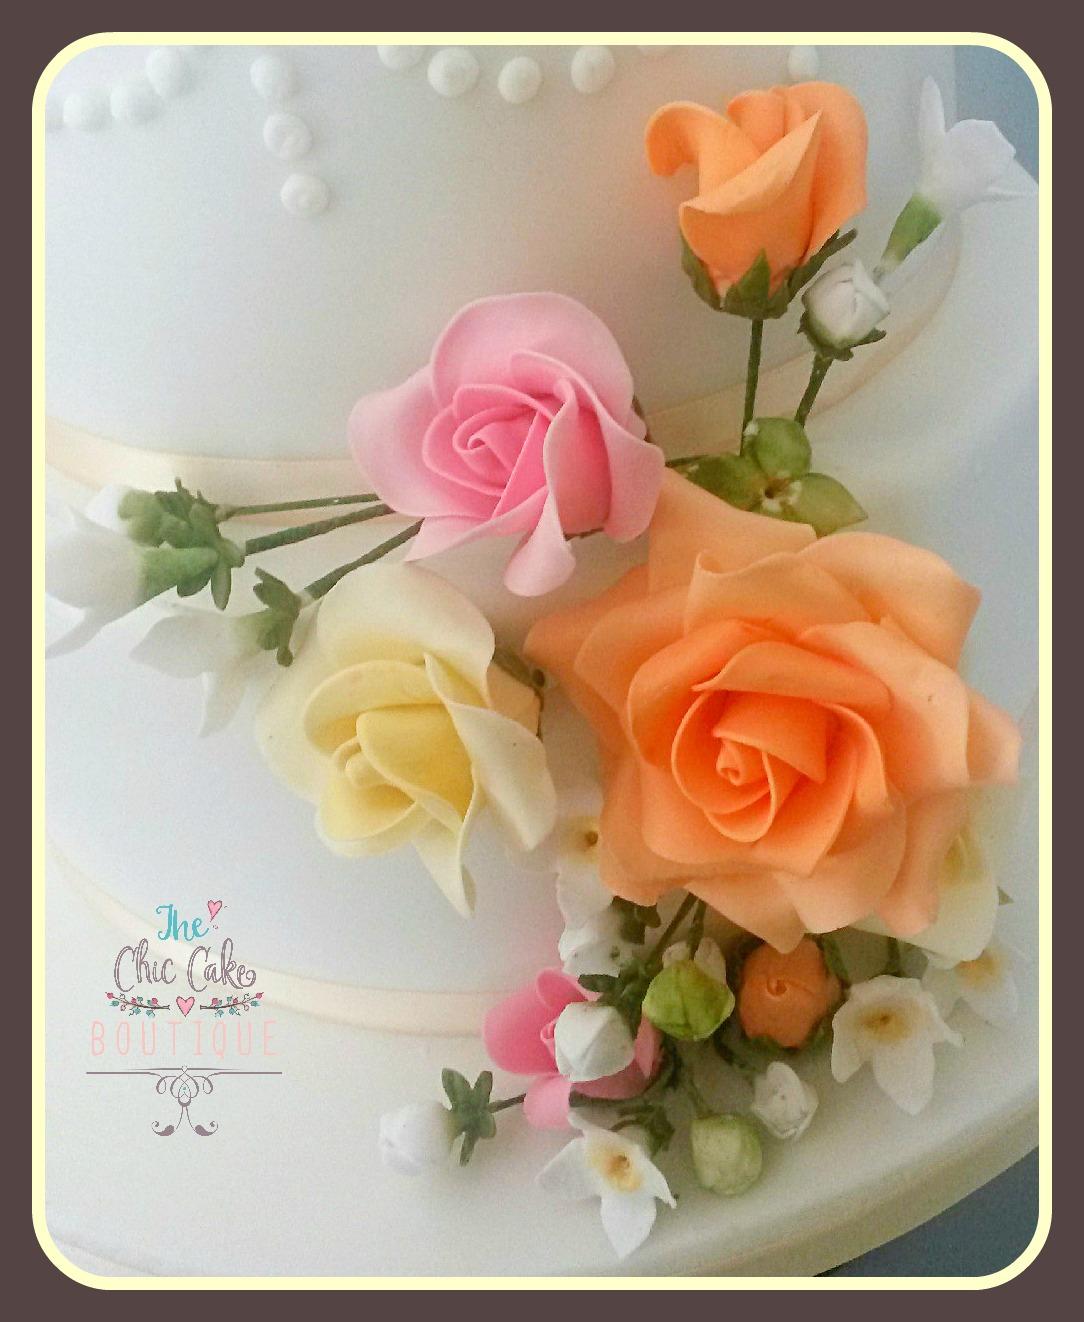 roses-peach sugar flowers